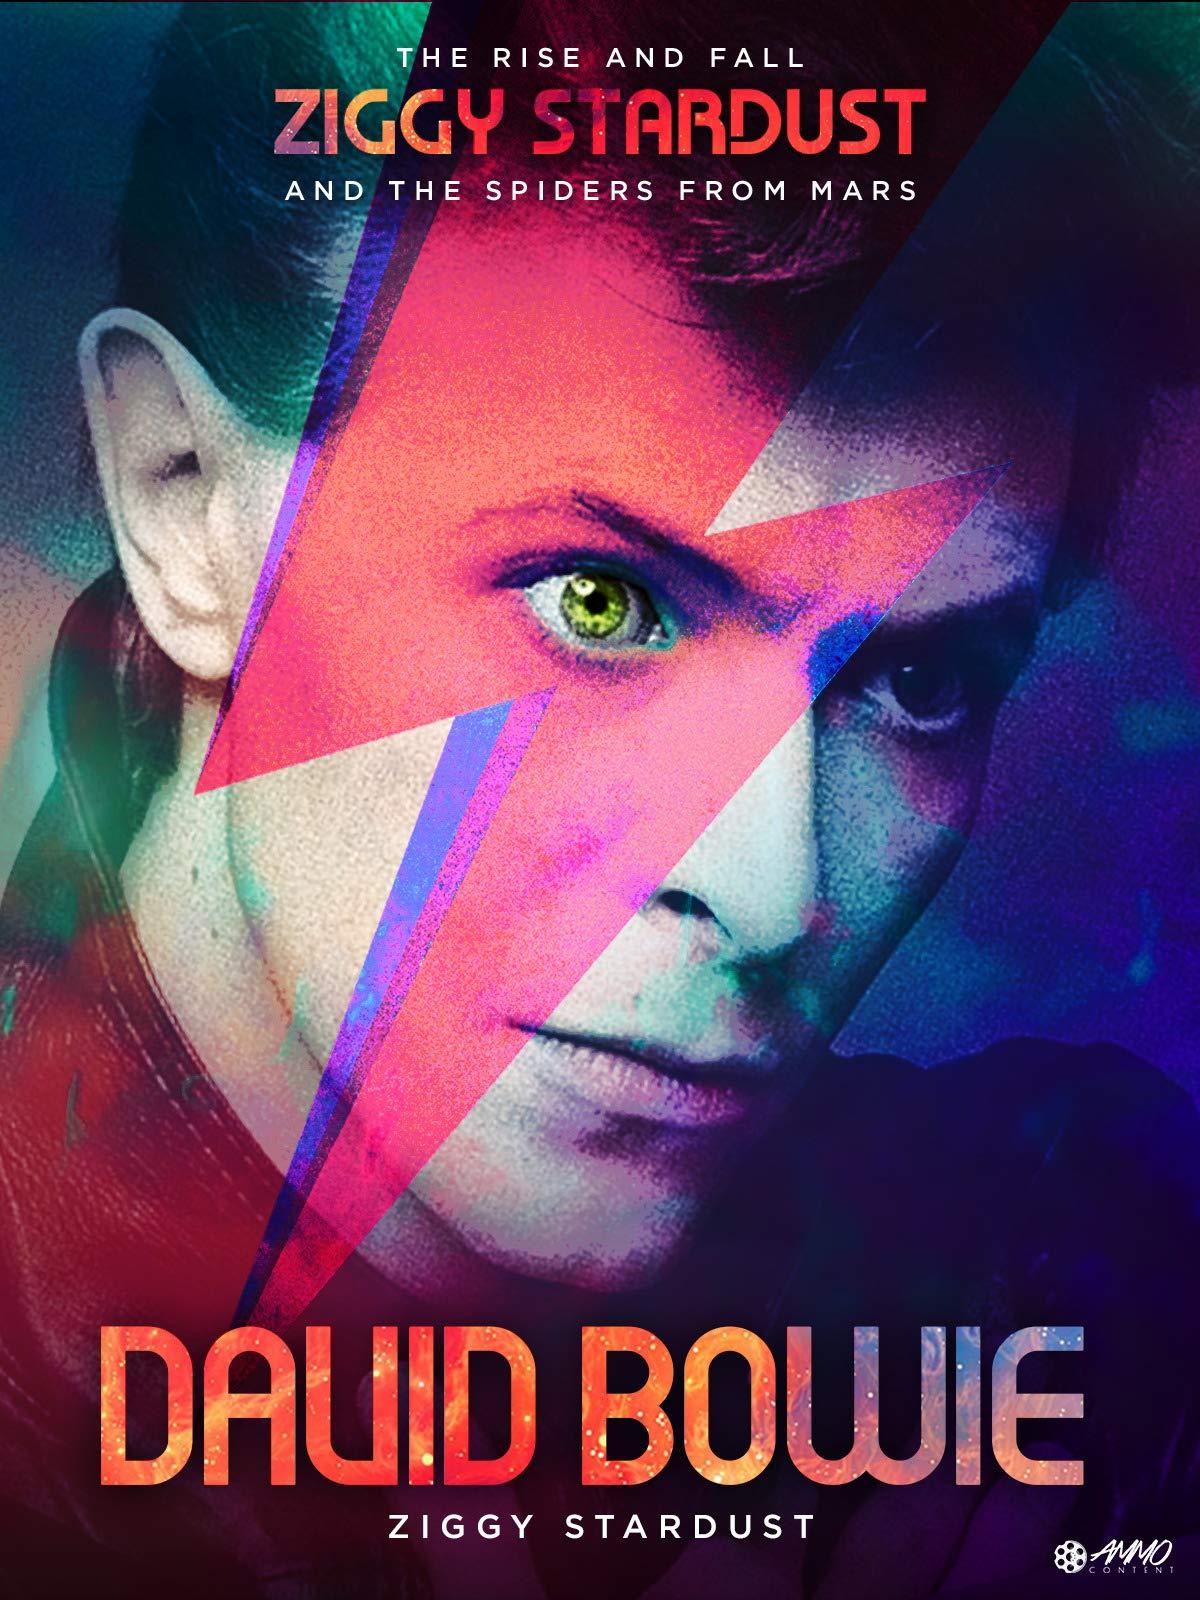 David Bowie: Ziggy Stardust on Amazon Prime Video UK